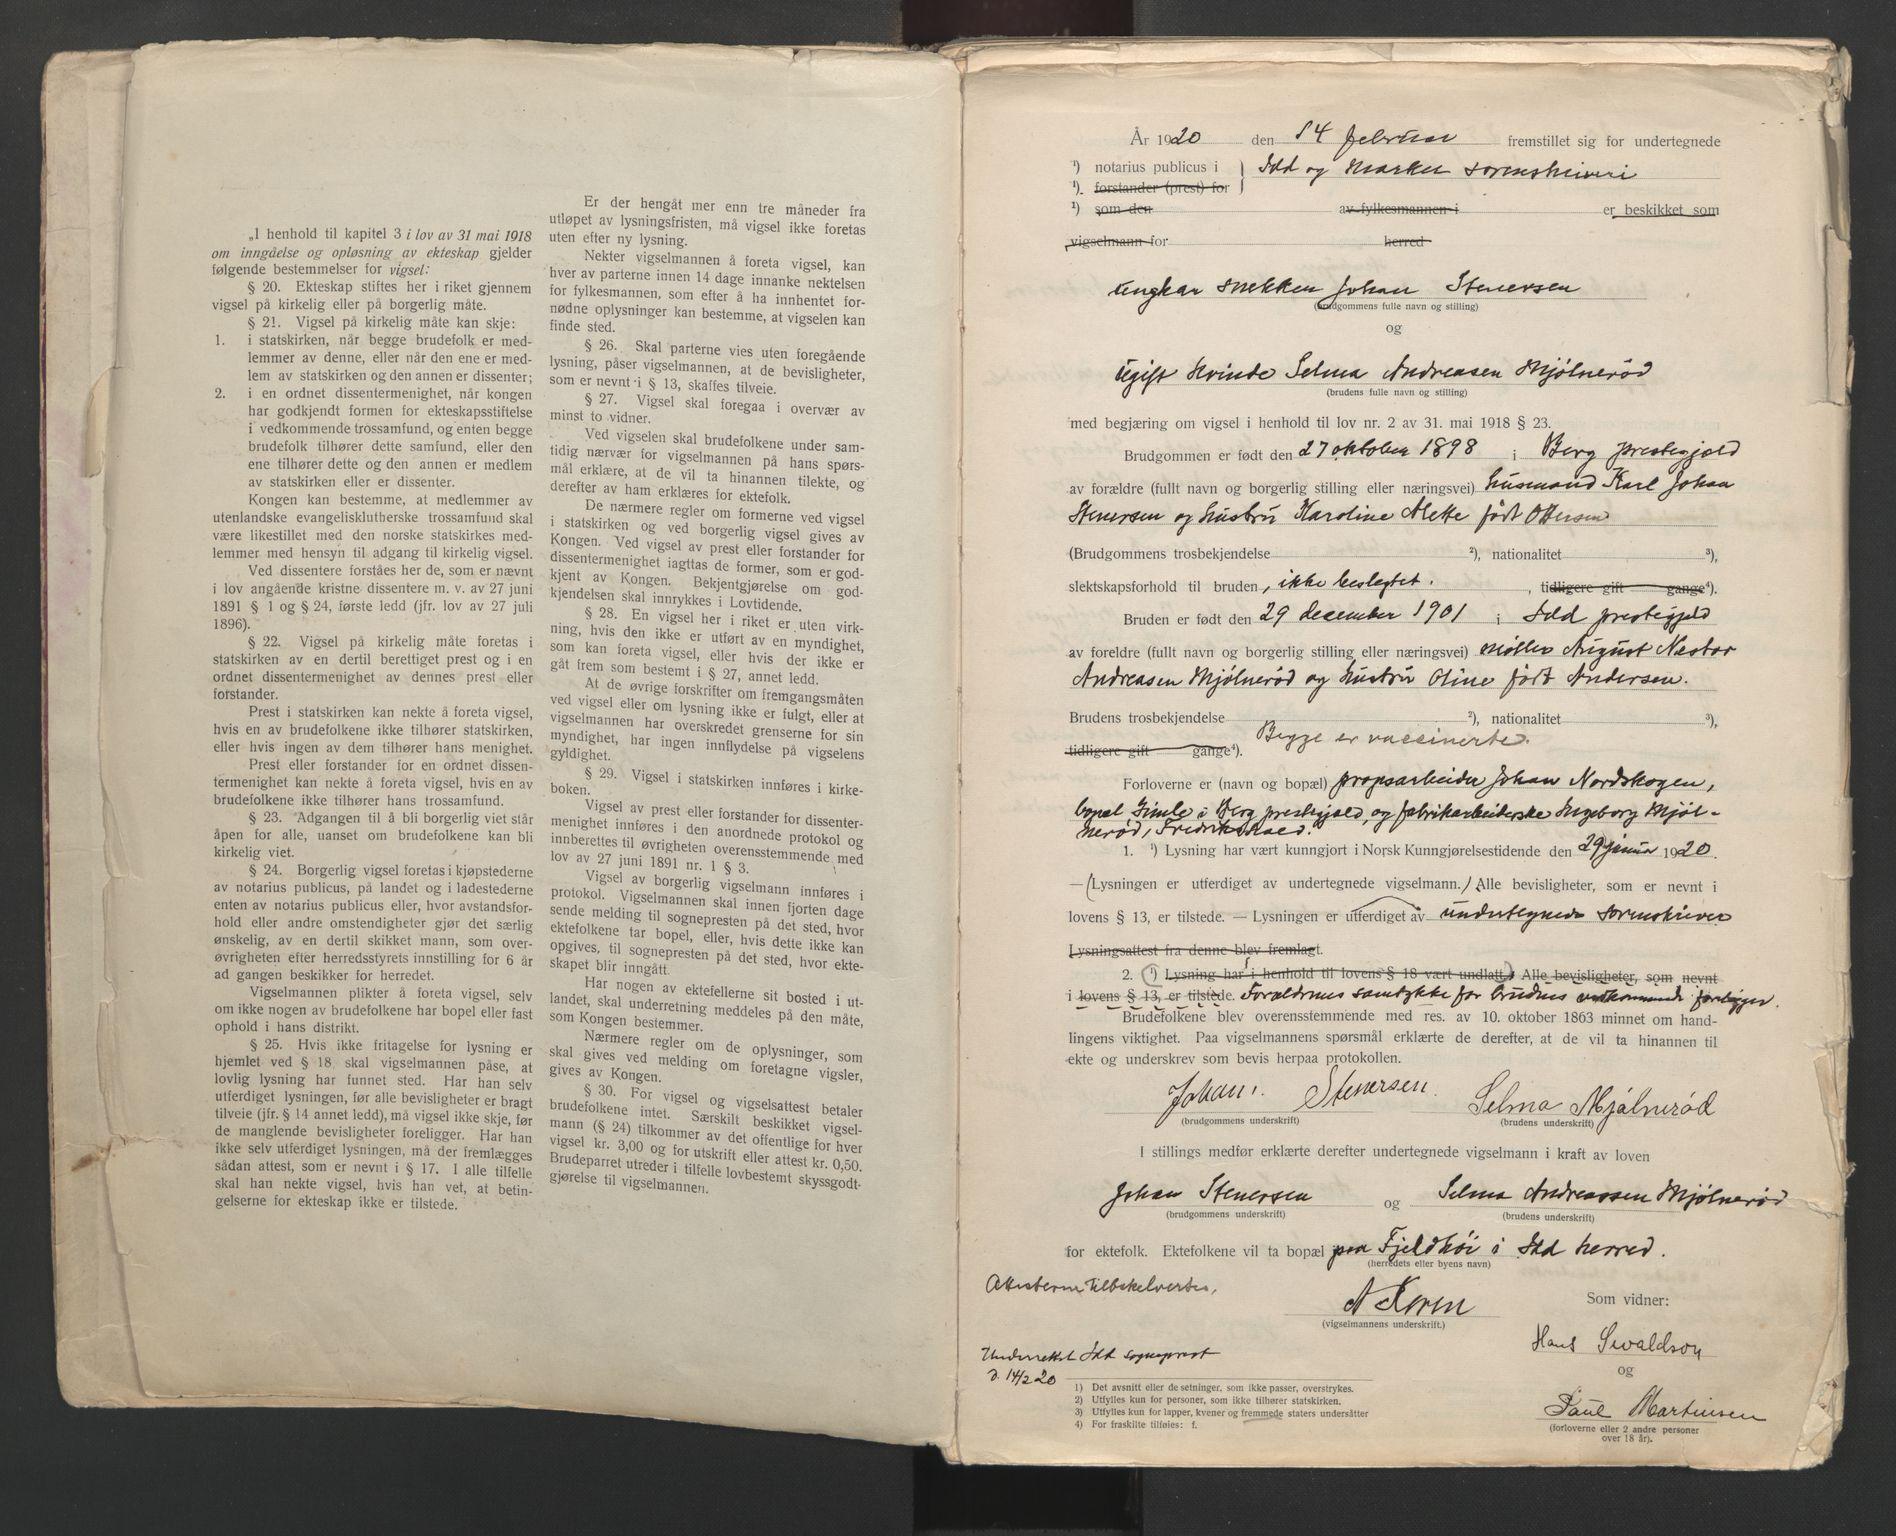 SAO, Idd og Marker sorenskriveri, L/Lc/L0001: Vigselsbøker, 1920-1942, s. 2